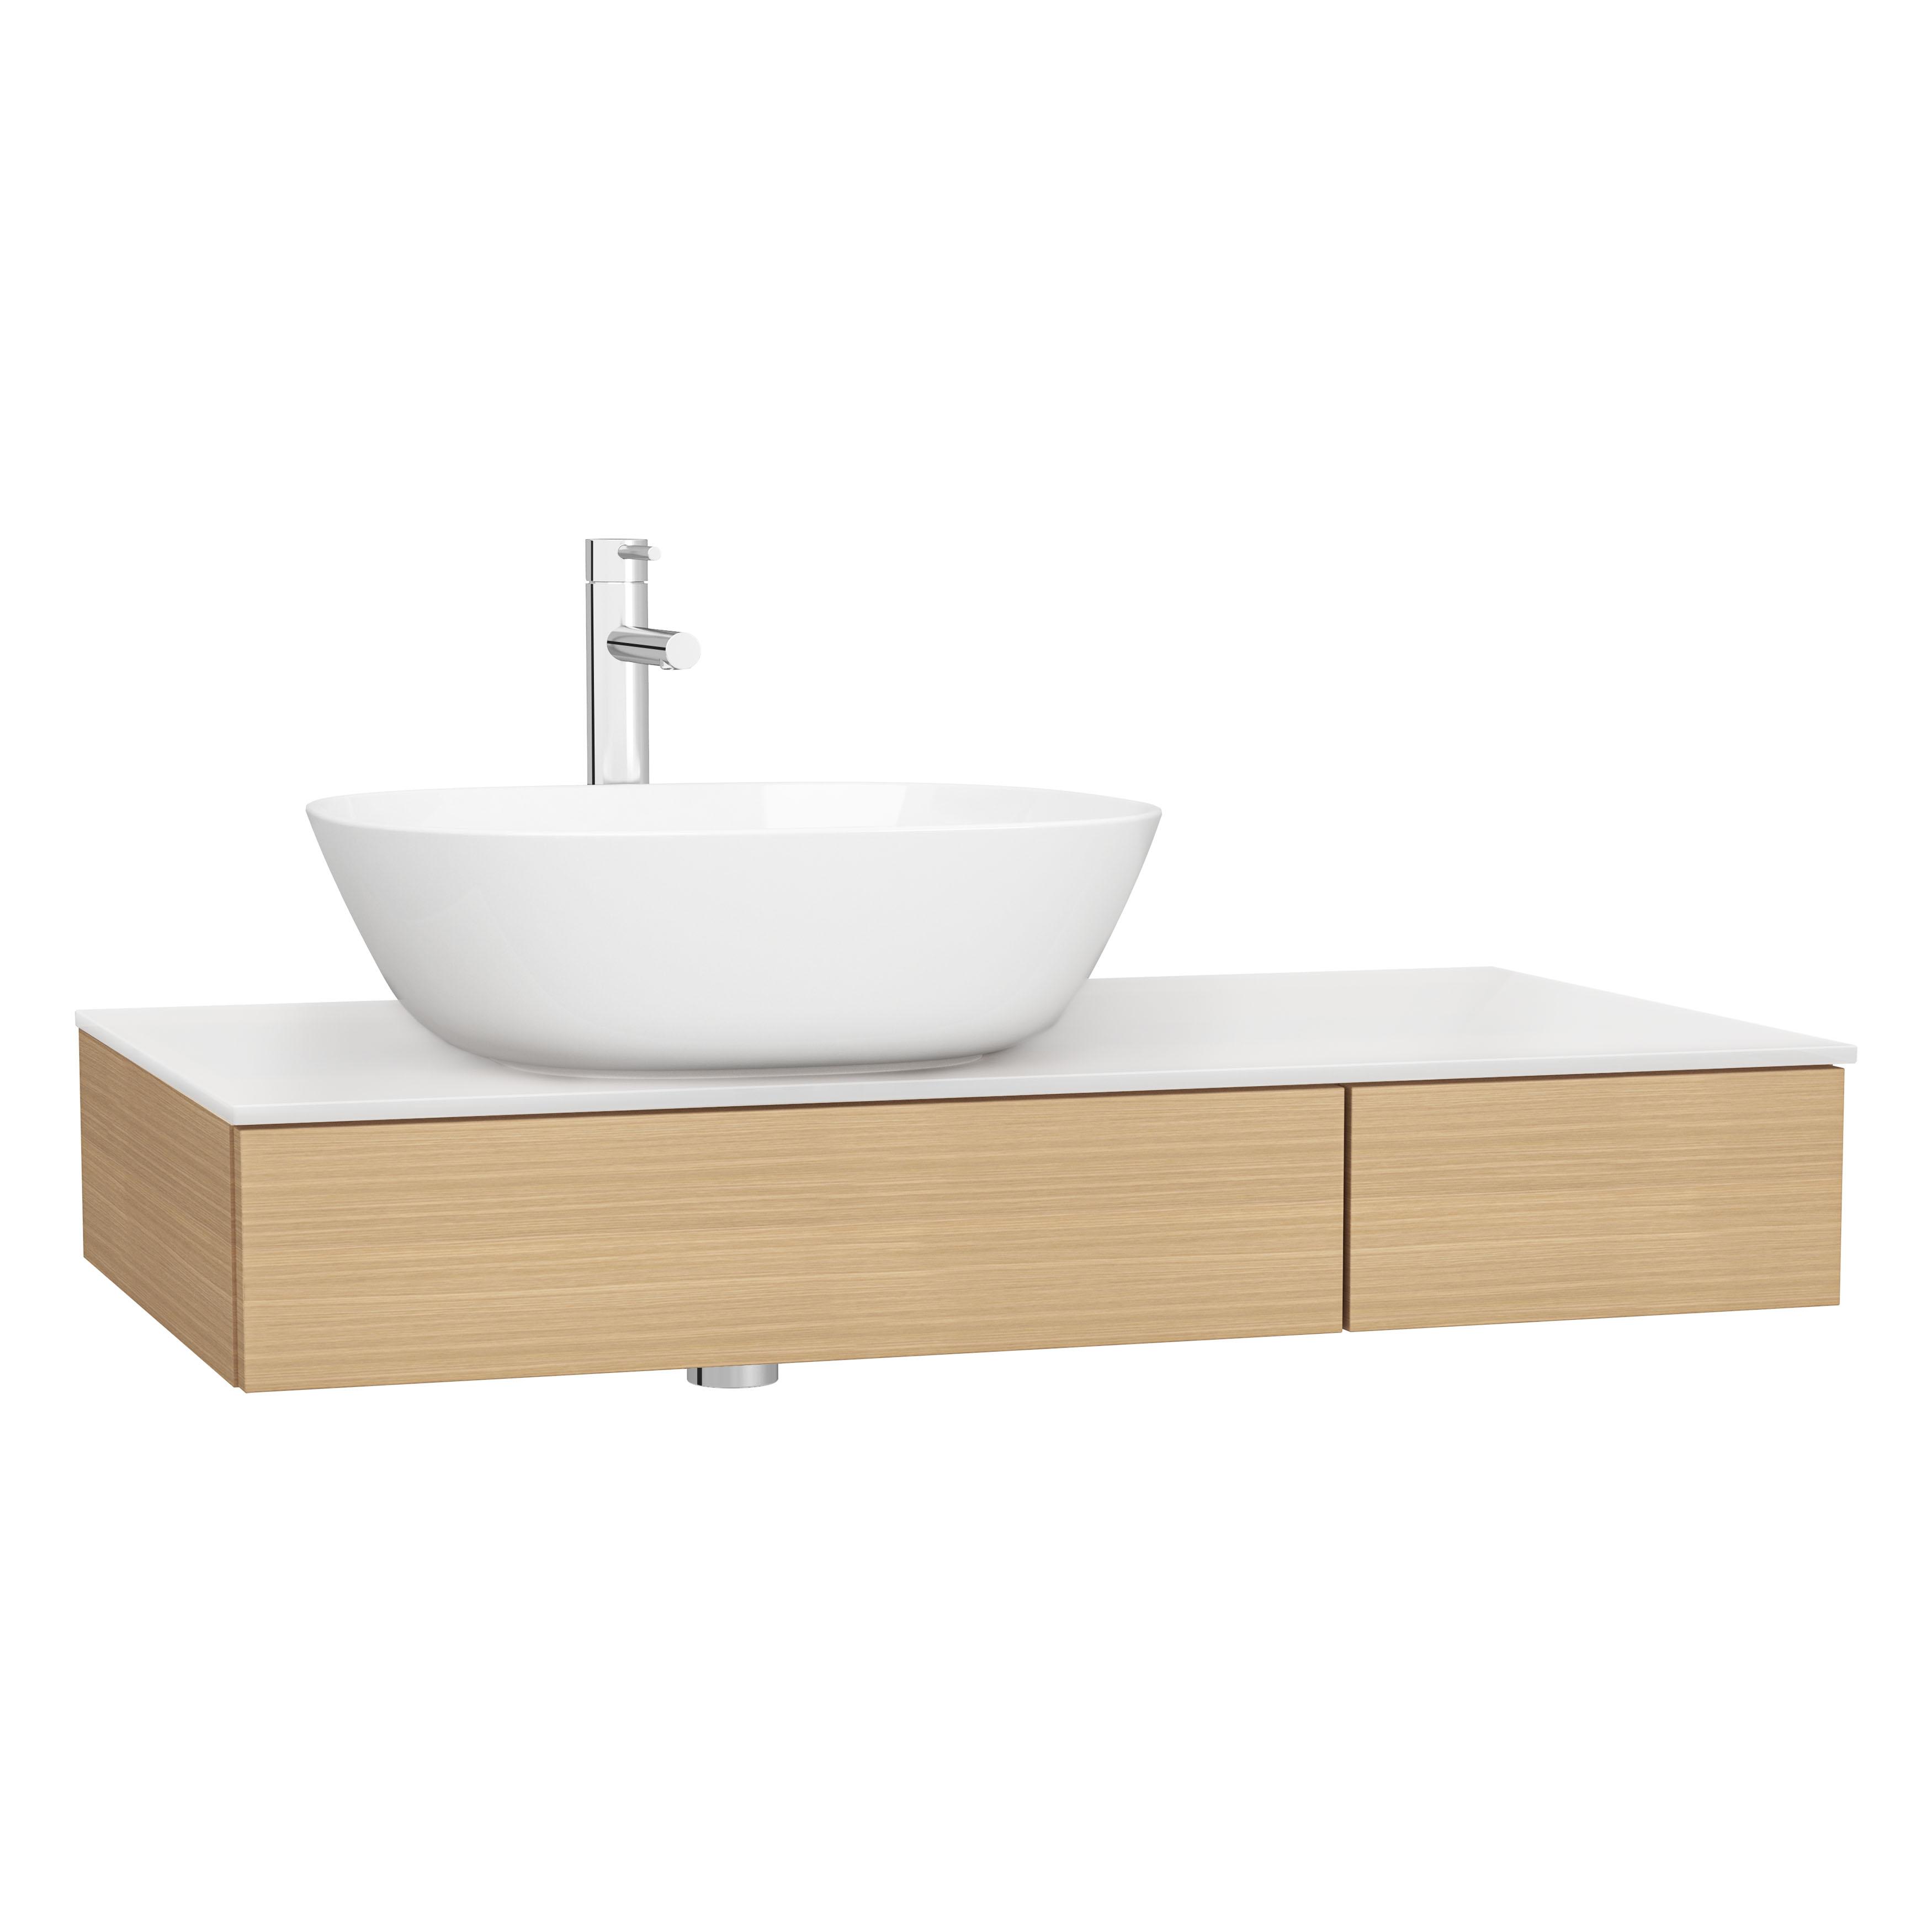 Origin plan de toilette avec tiroir, 90 cm, chêne ferrera, gauche